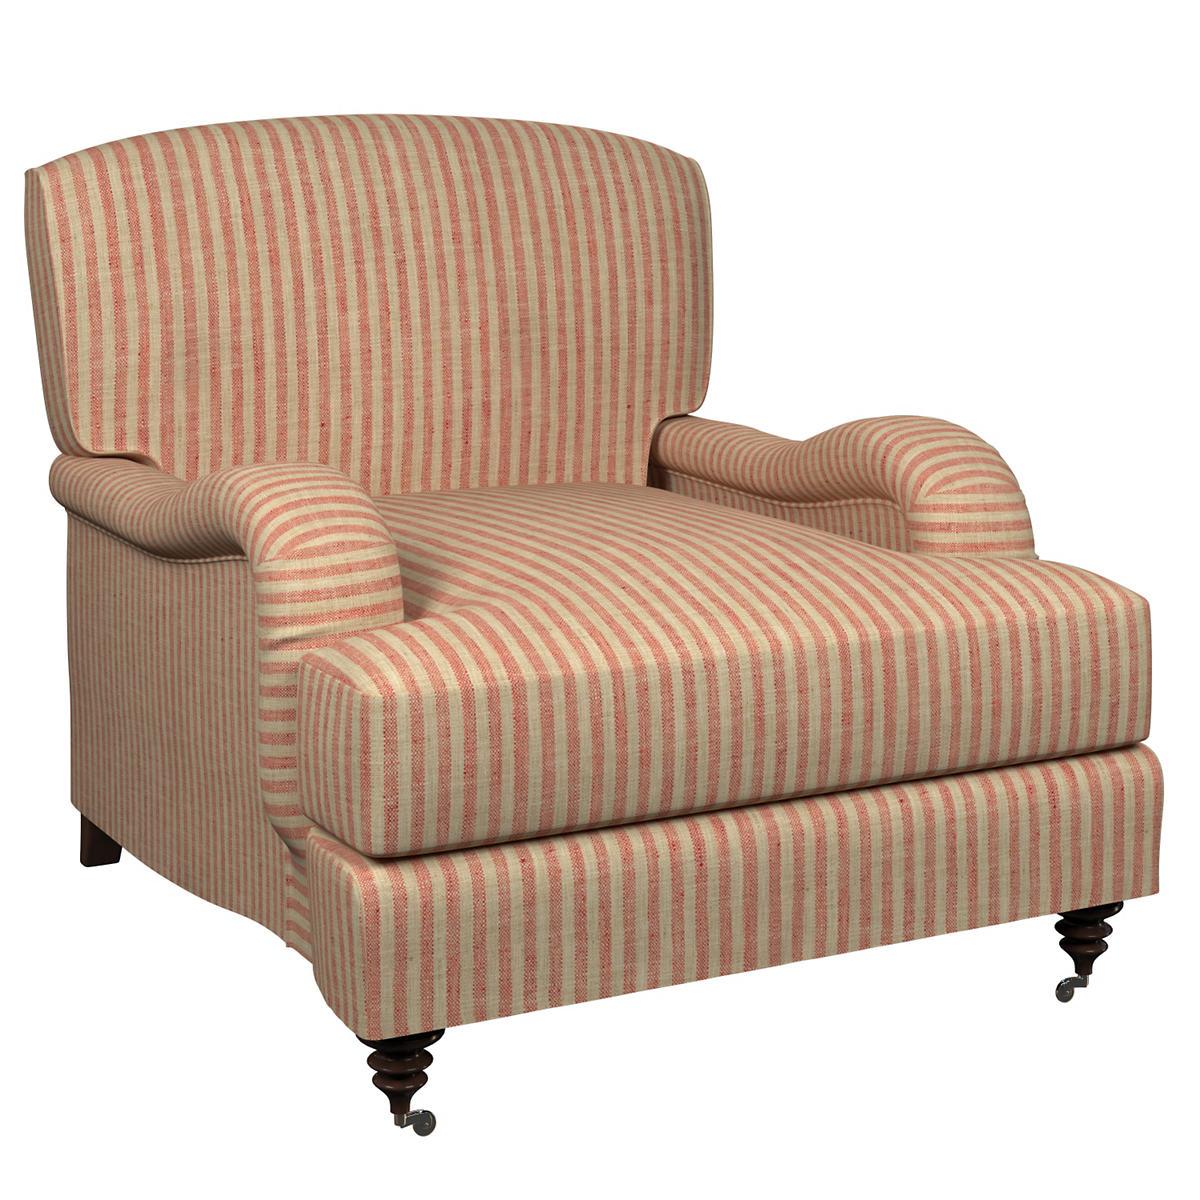 Adams Ticking Brick Litchfield Chair